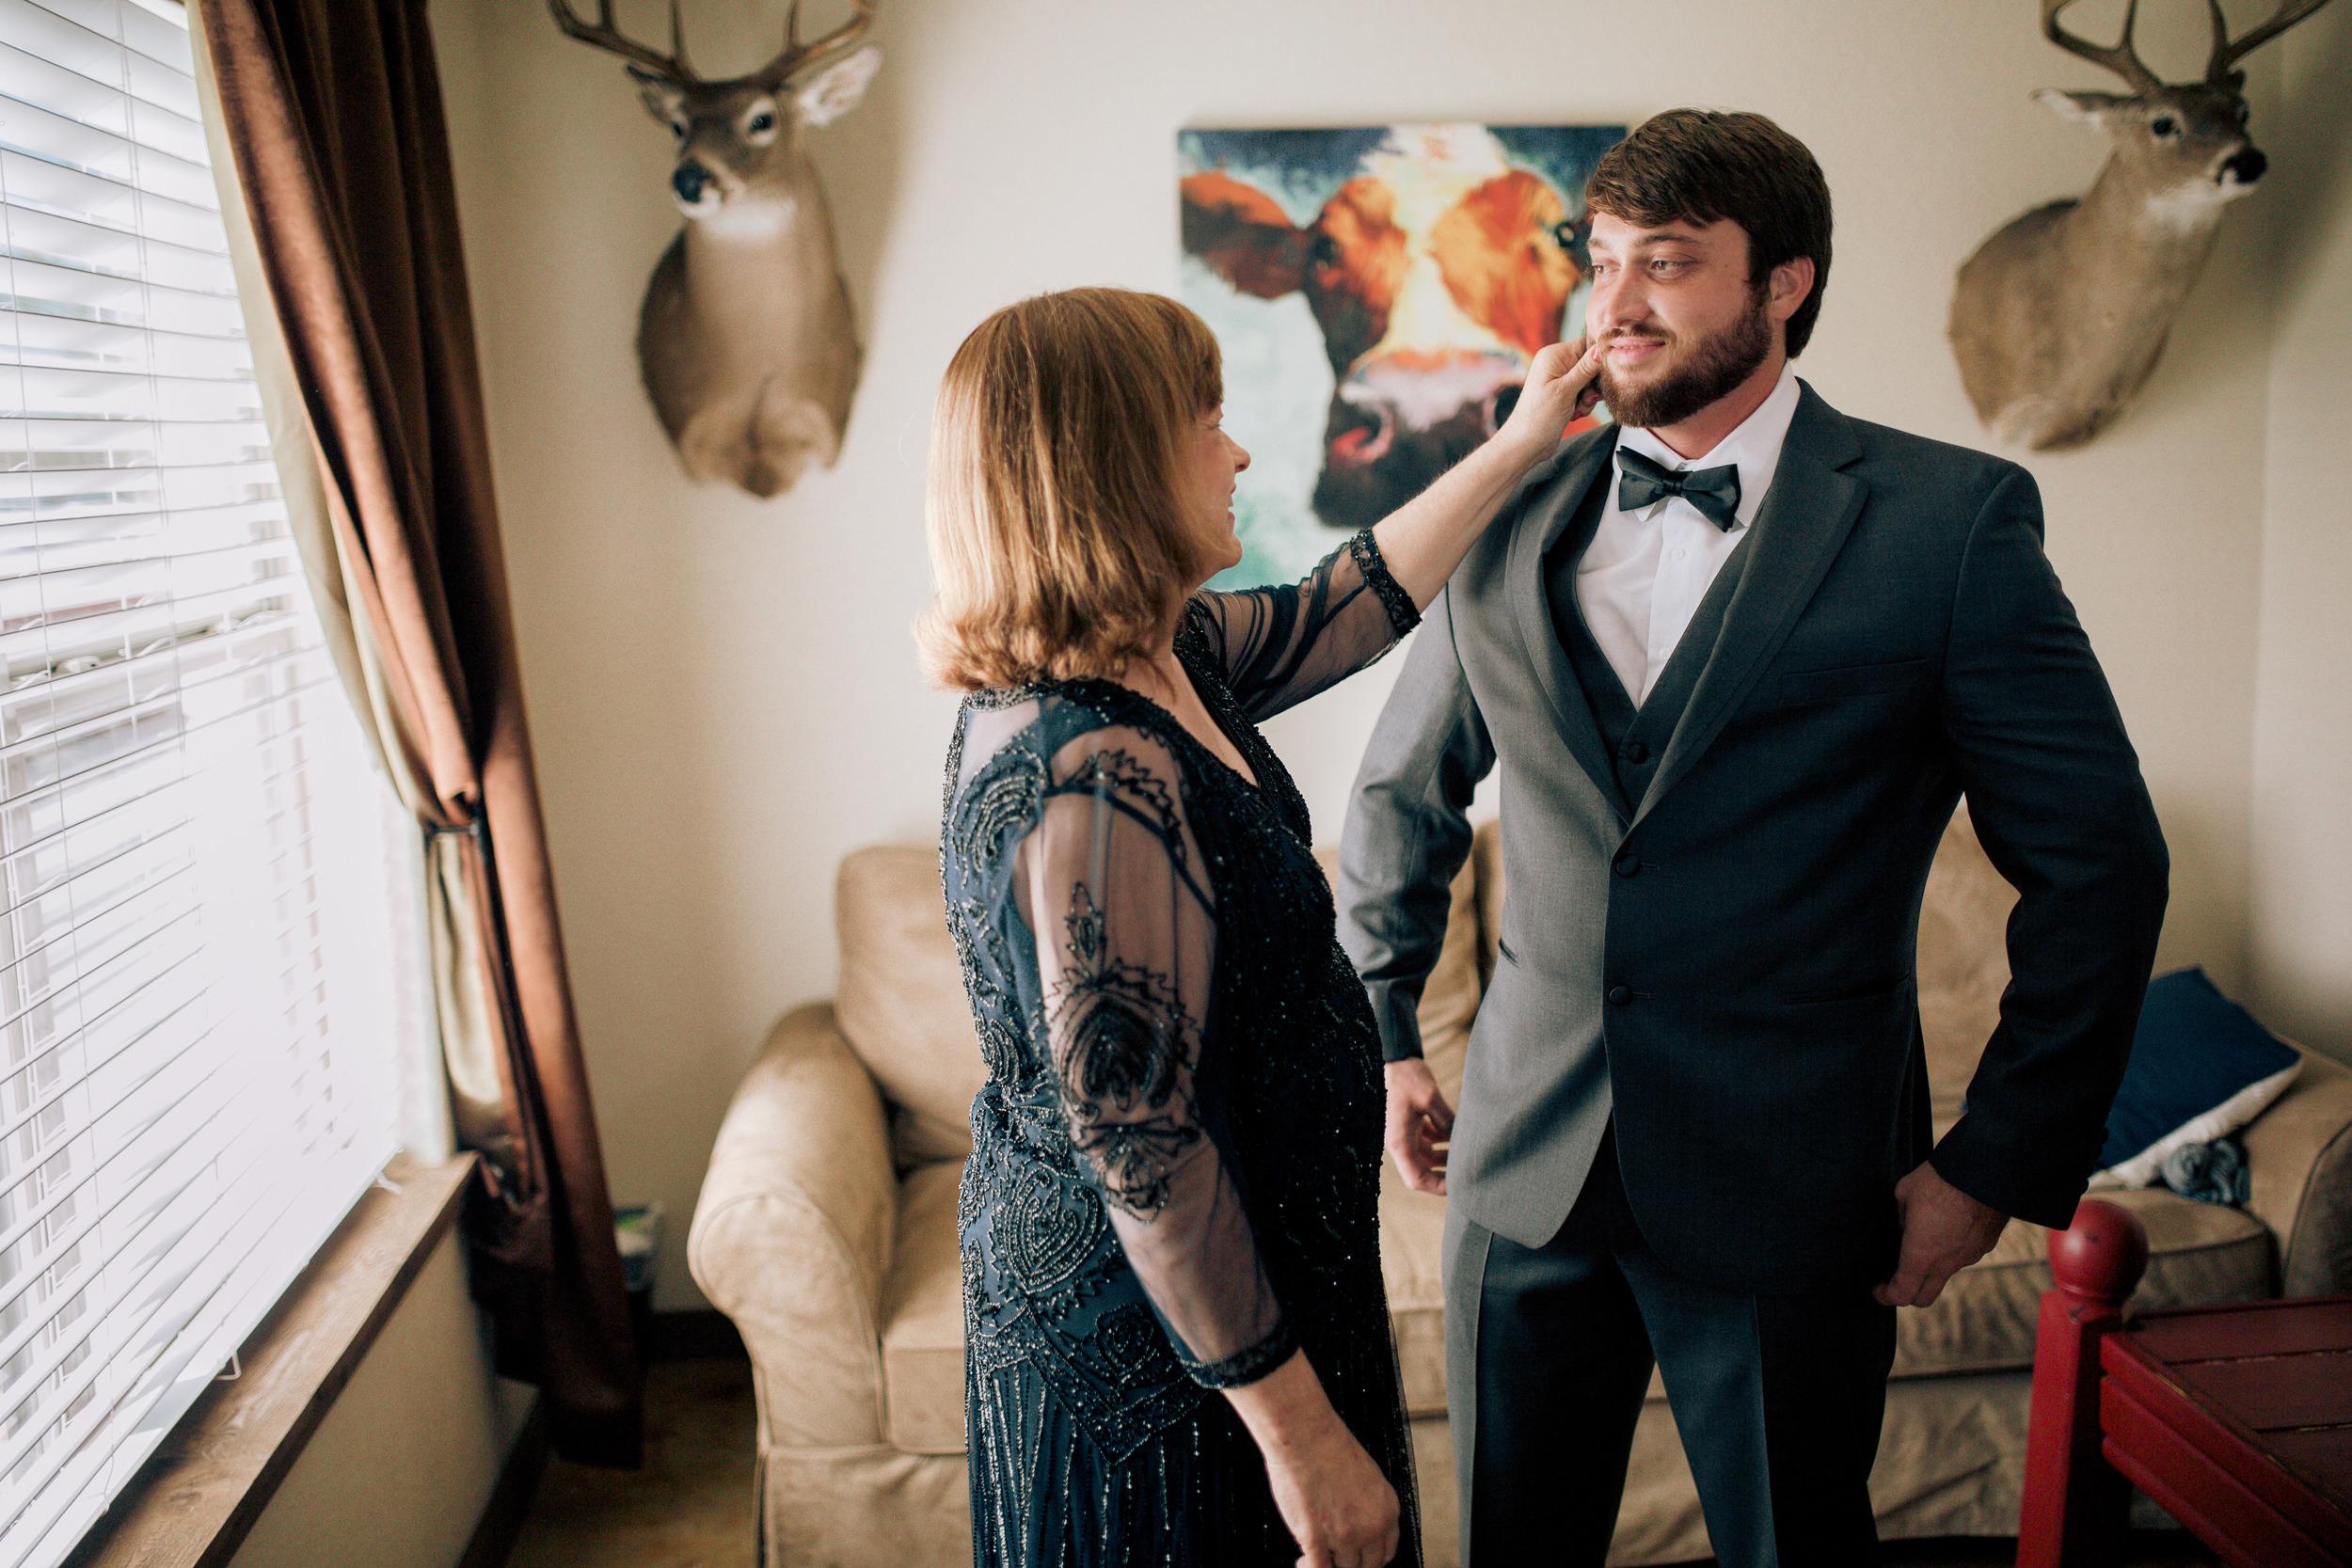 alaa-marzouk-photography-rgvweddingphotographer-rio-grande-valley-mathis-wedding-bridal-bride-san-antonio-portrait-weddings-mcallen.jpg